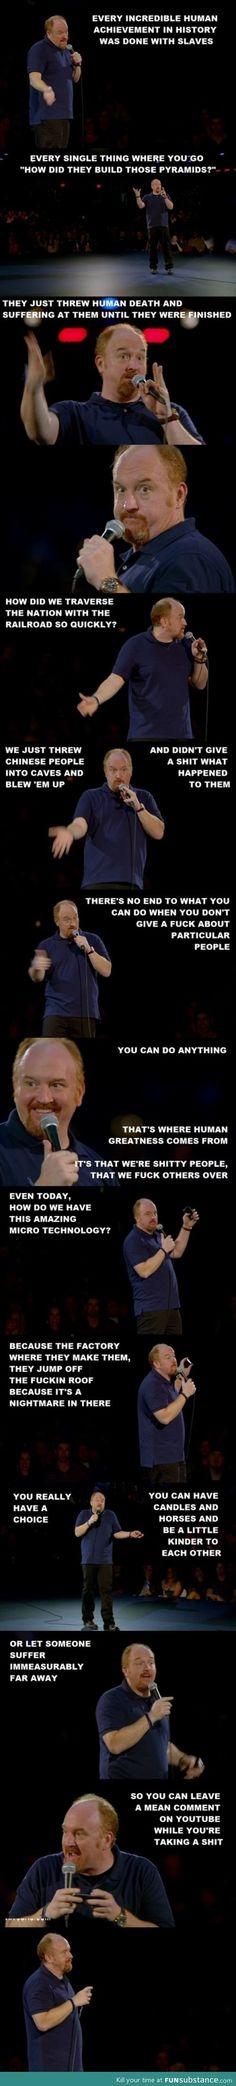 Hes got a point